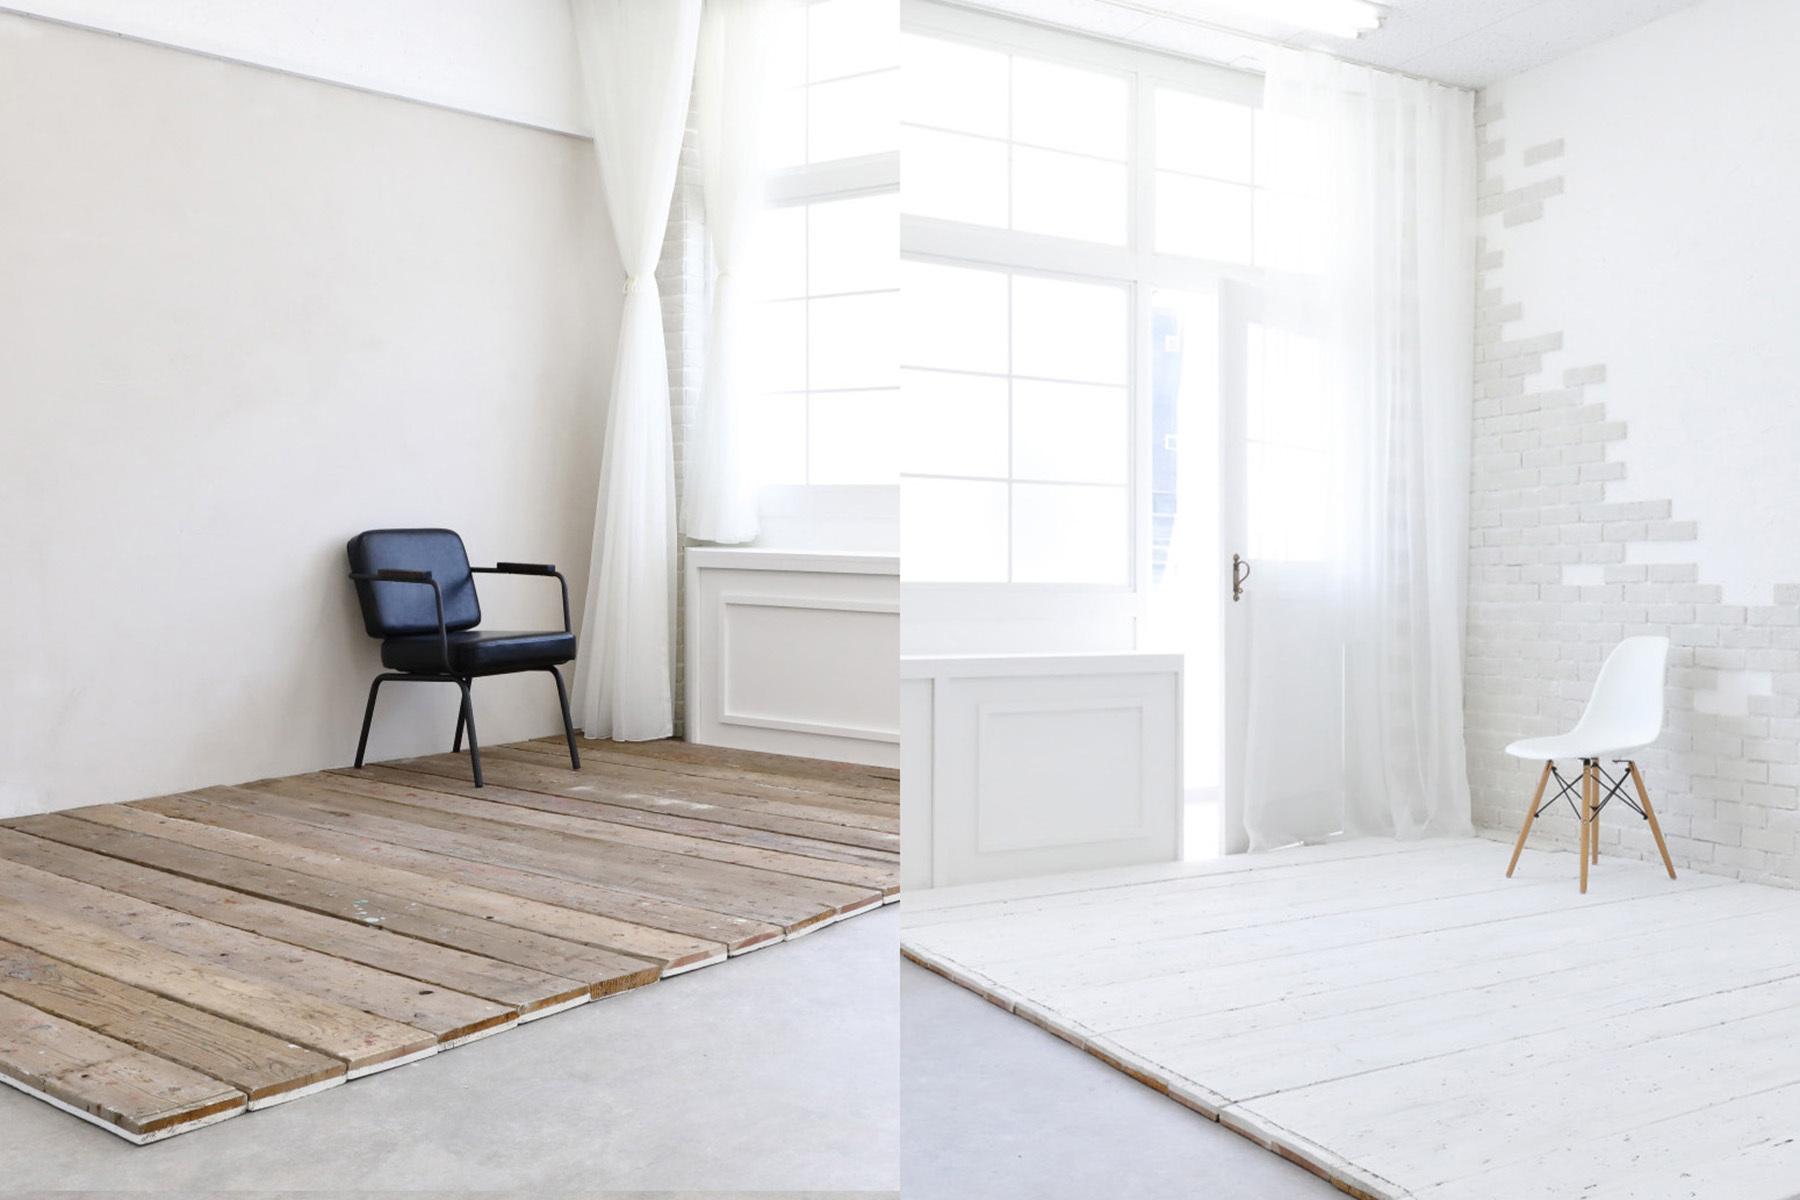 STUDIO TWOBEE  (スタジオ トゥービー)白窓の棚は小物などを置いて演出